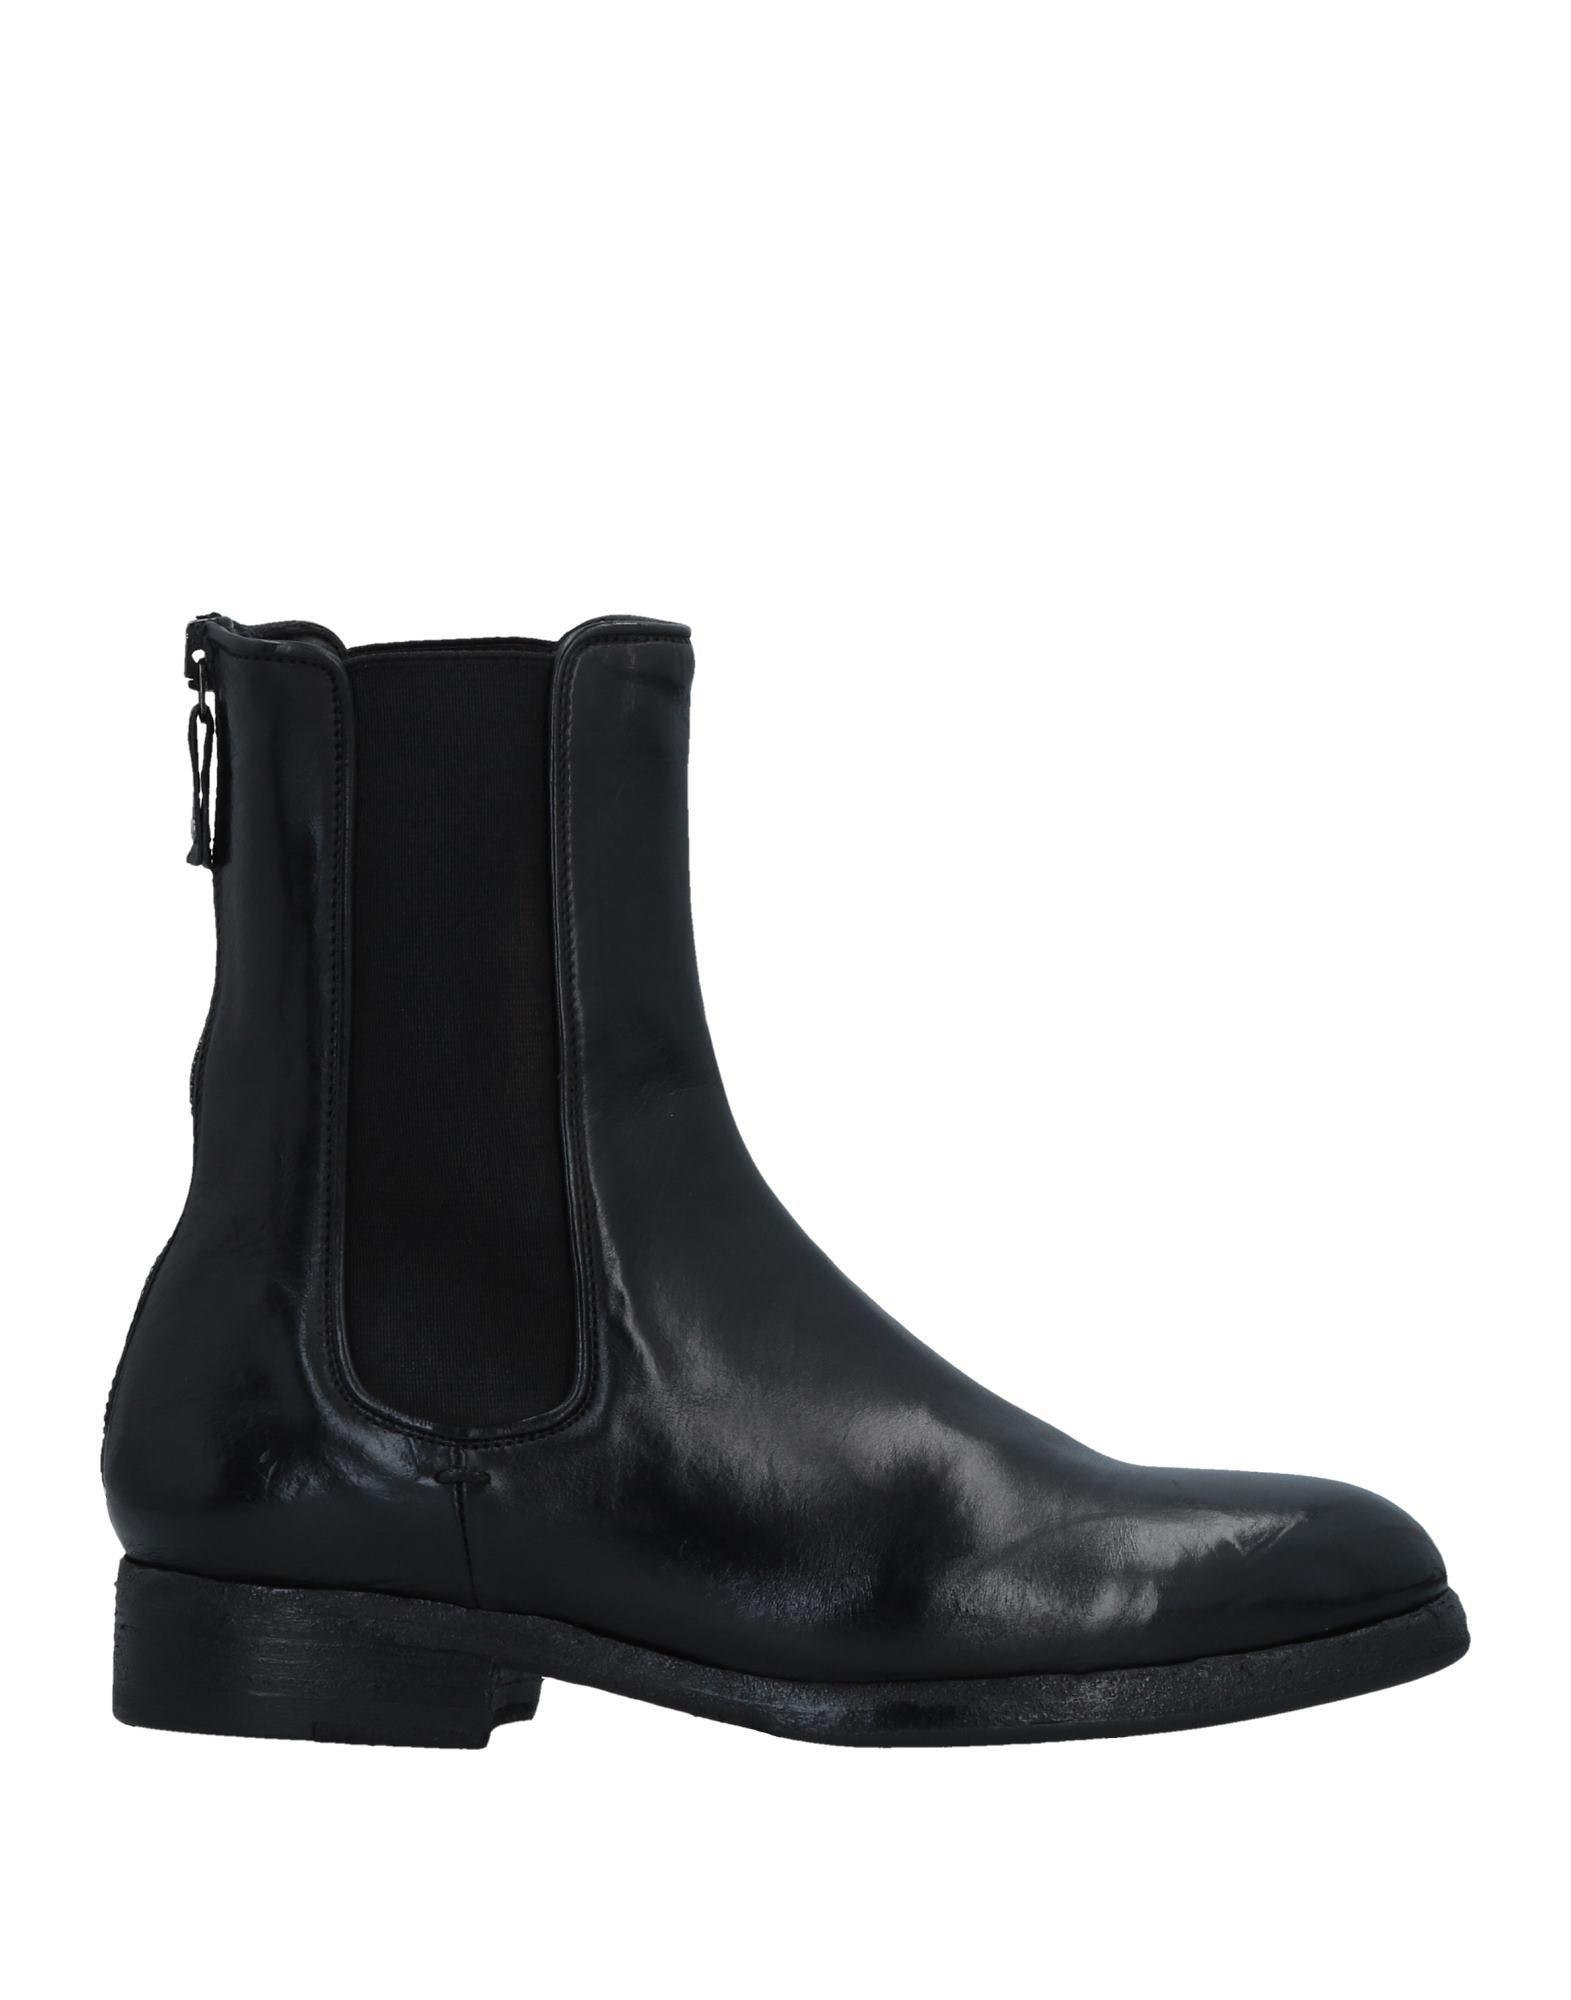 SARTORI GOLD Ankle Boot in Black